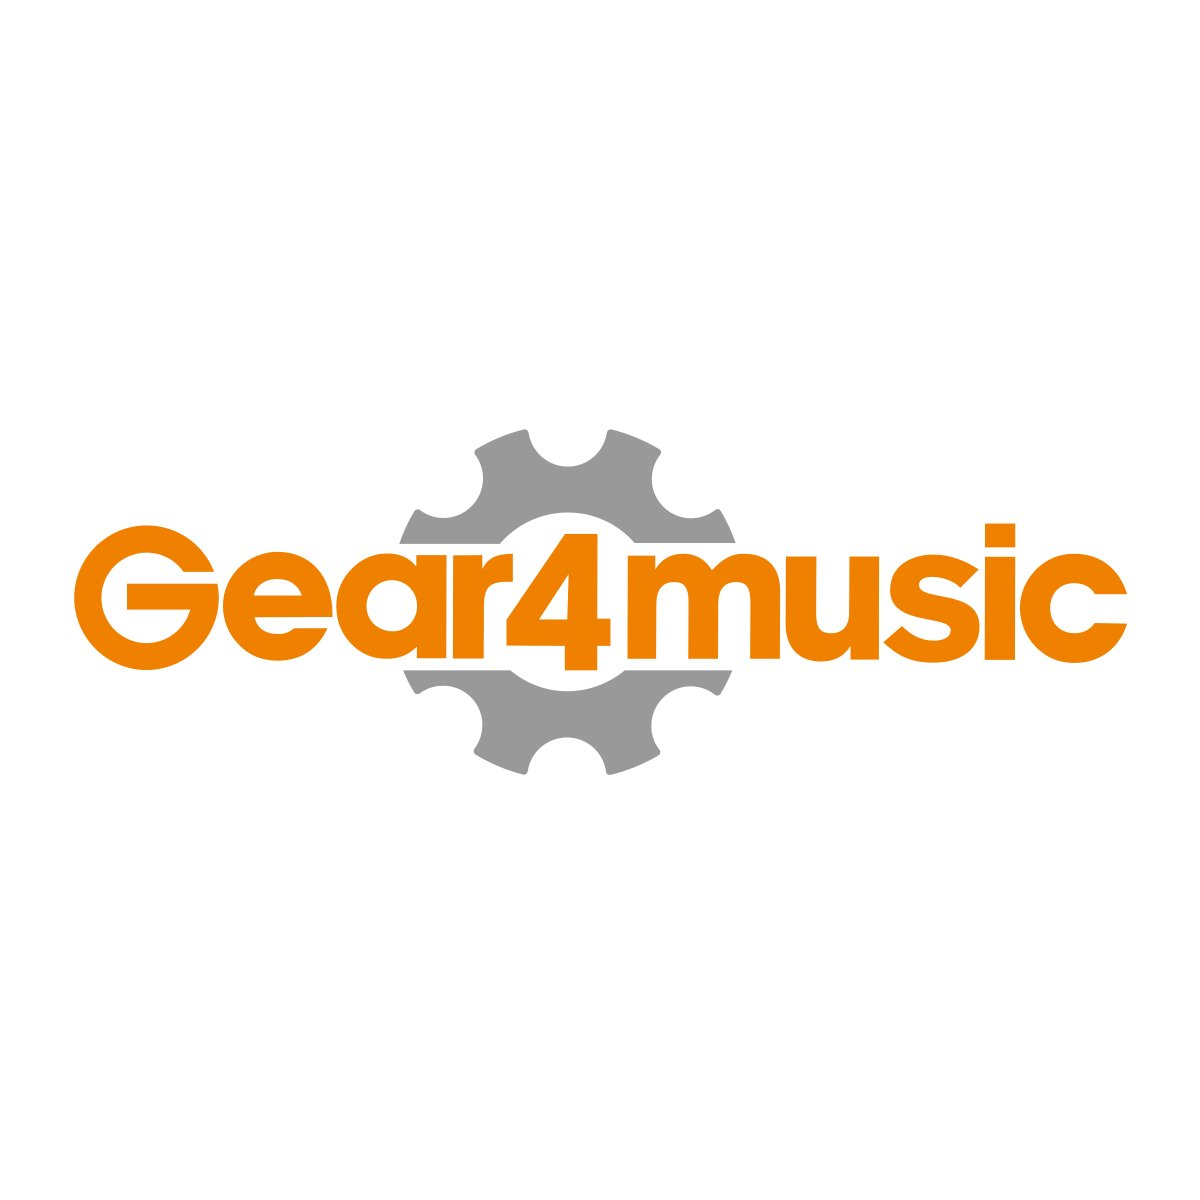 san diego semi acoustic guitar by gear4music sunburst at gear4music. Black Bedroom Furniture Sets. Home Design Ideas